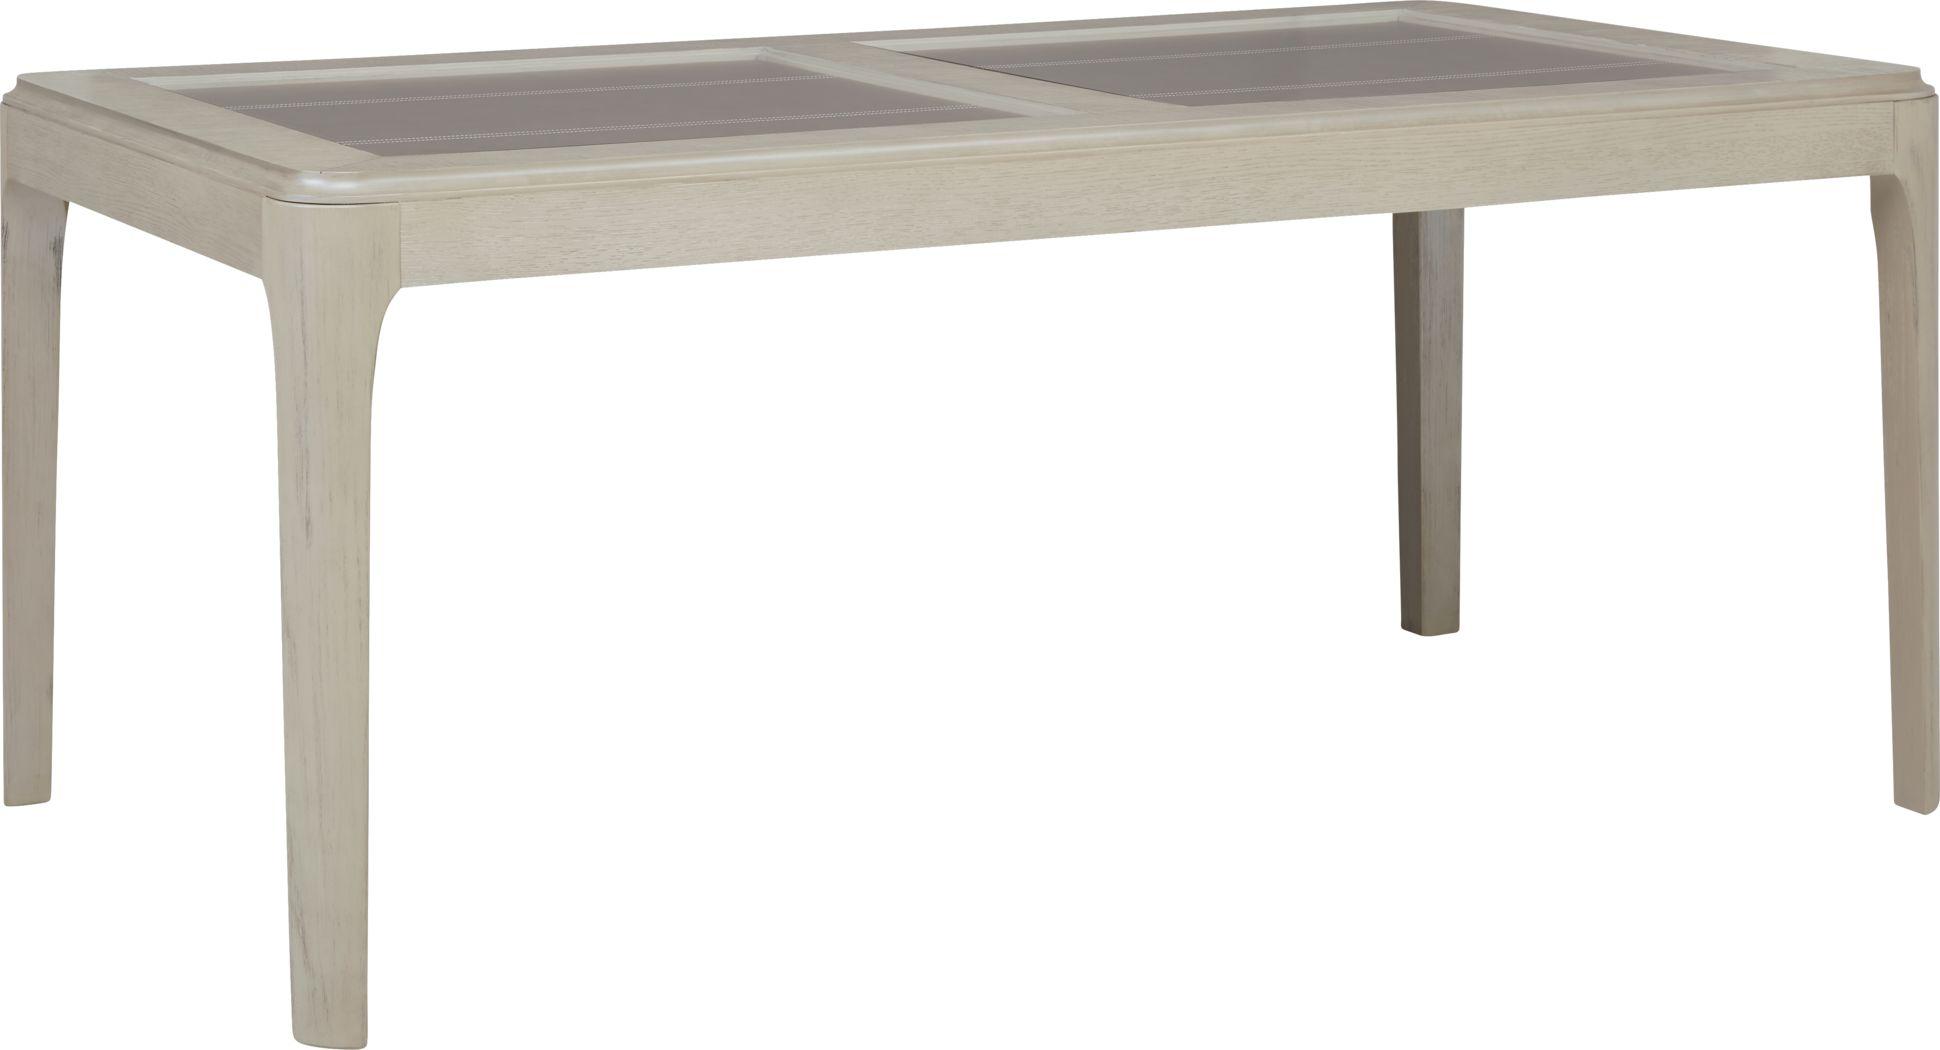 Holliston Gray Rectangle Dining Table